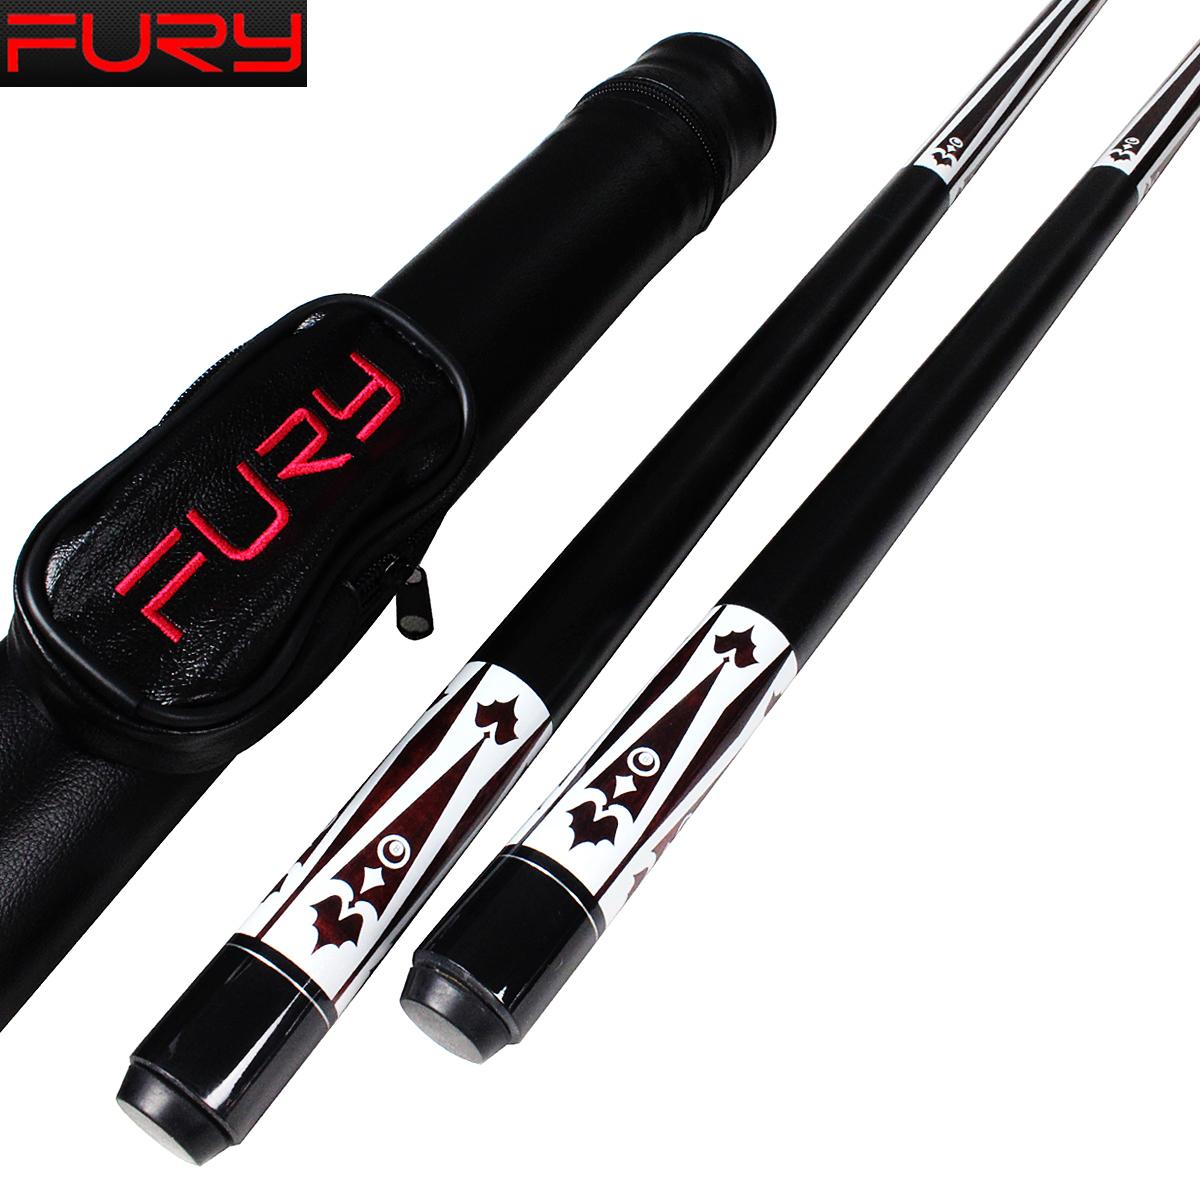 Bucket american fury snooker ball rod 16 googlers rod black 8 snooker pole(China (Mainland))